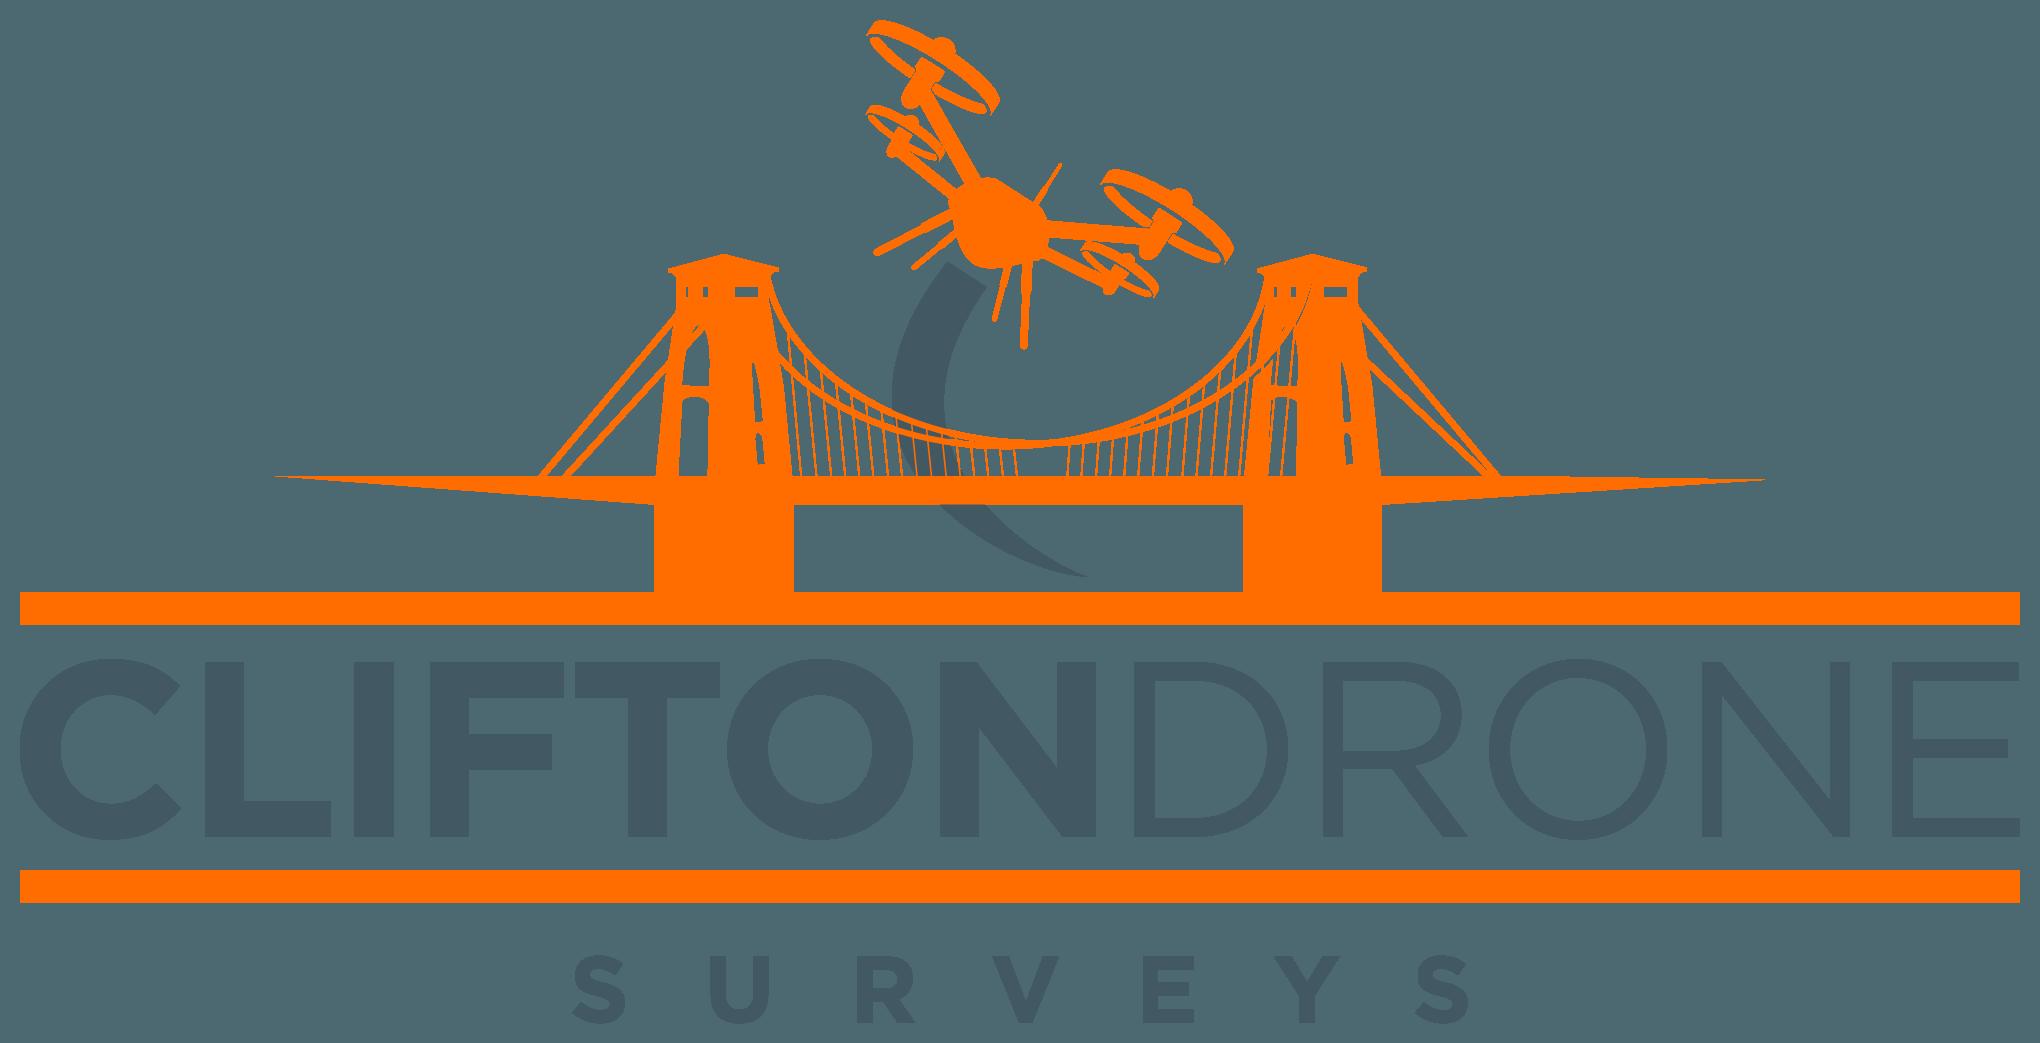 Clifton Drone Surveys